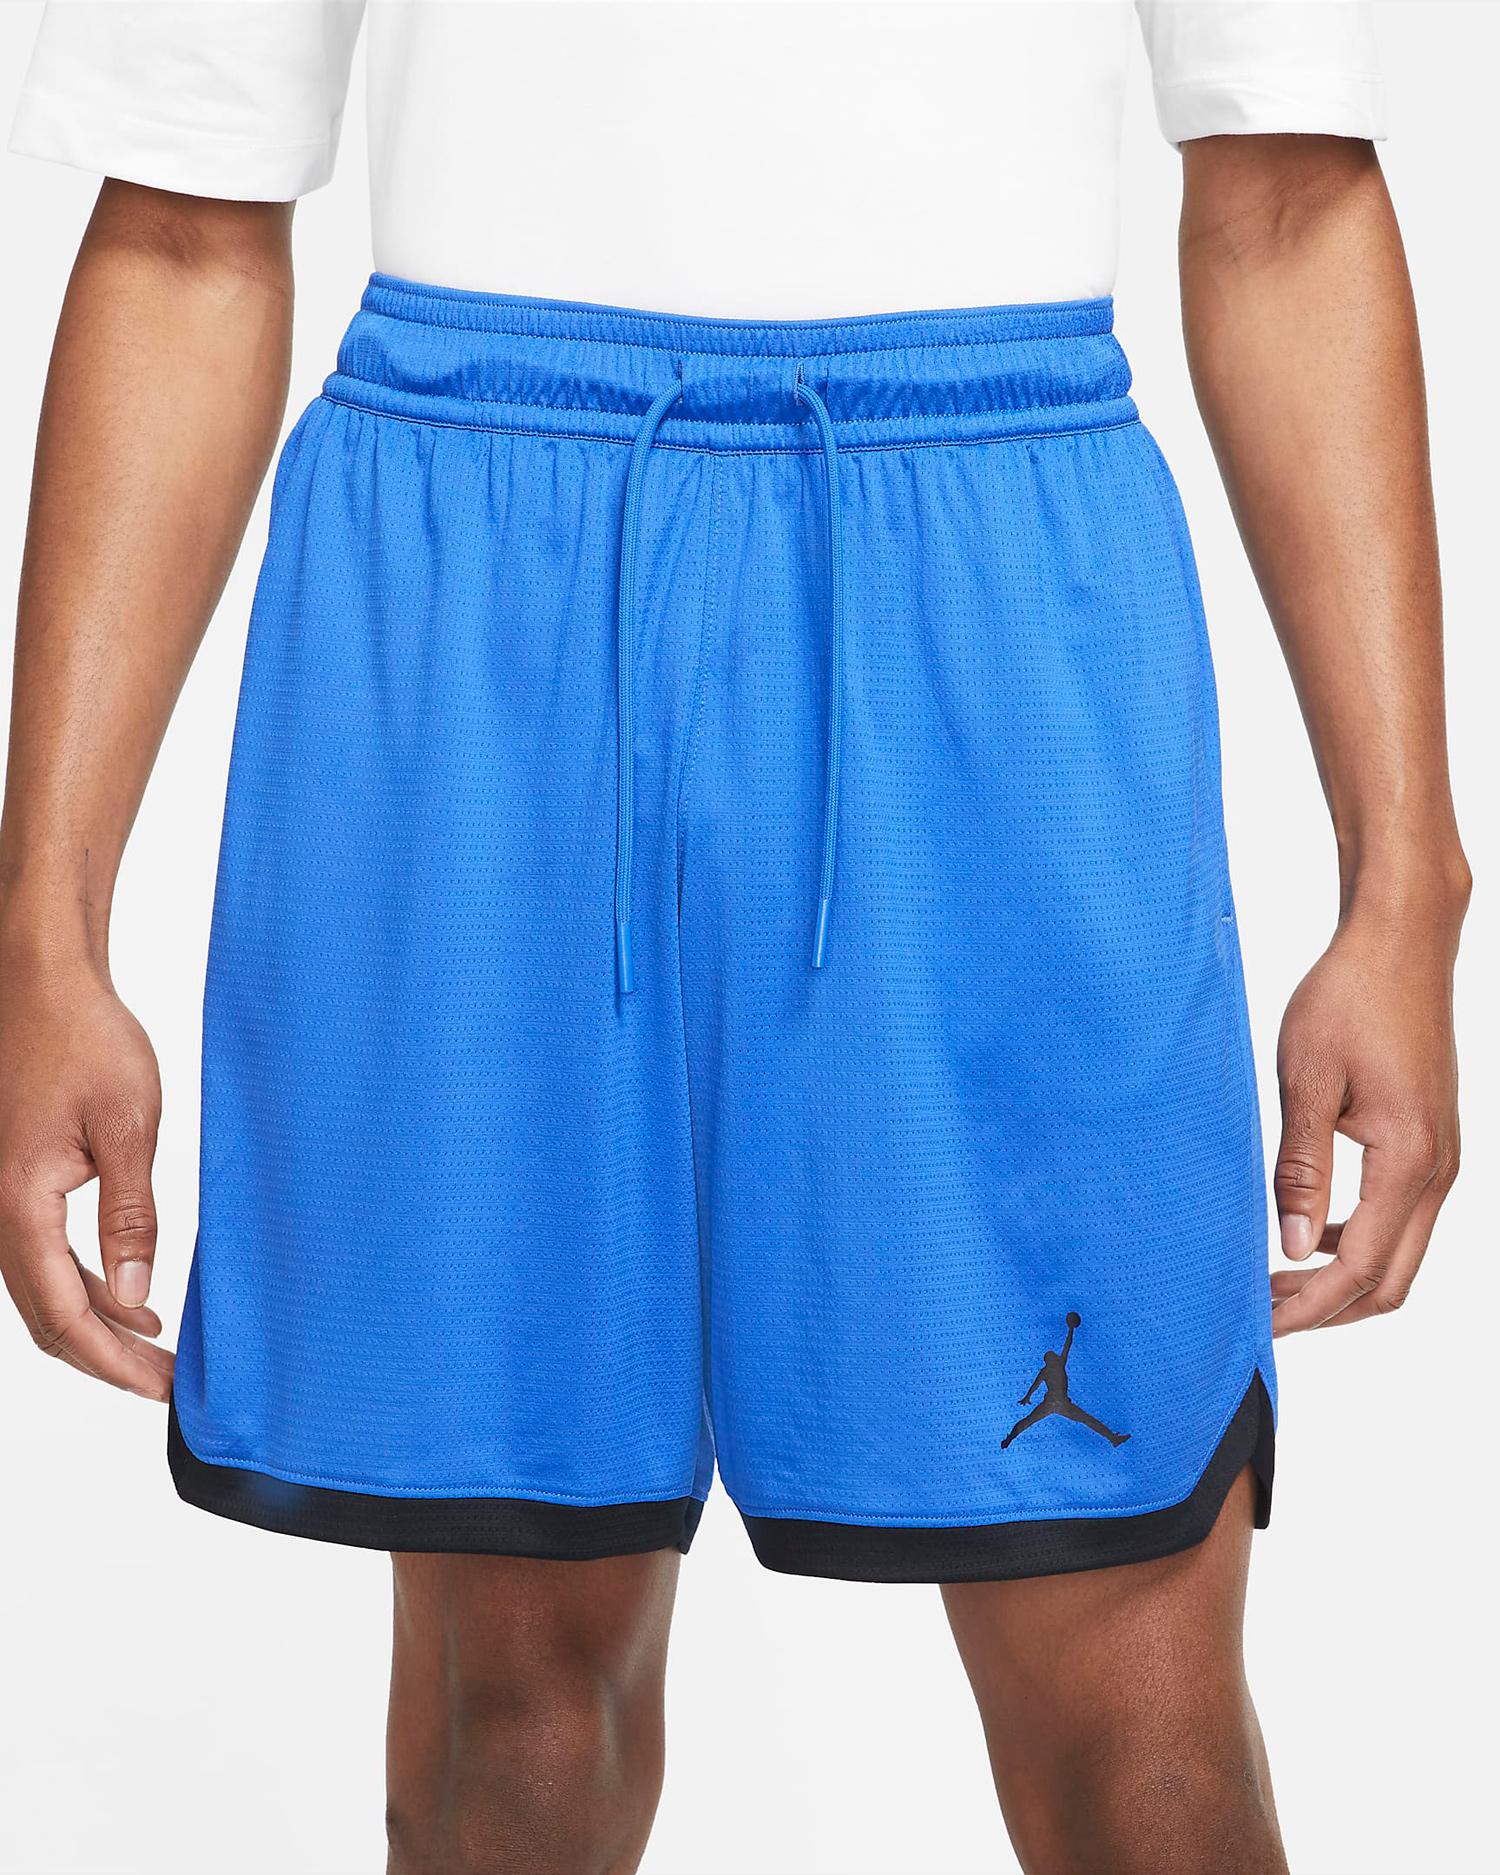 jordan-hyper-royal-dri-fit-knit-shorts-2